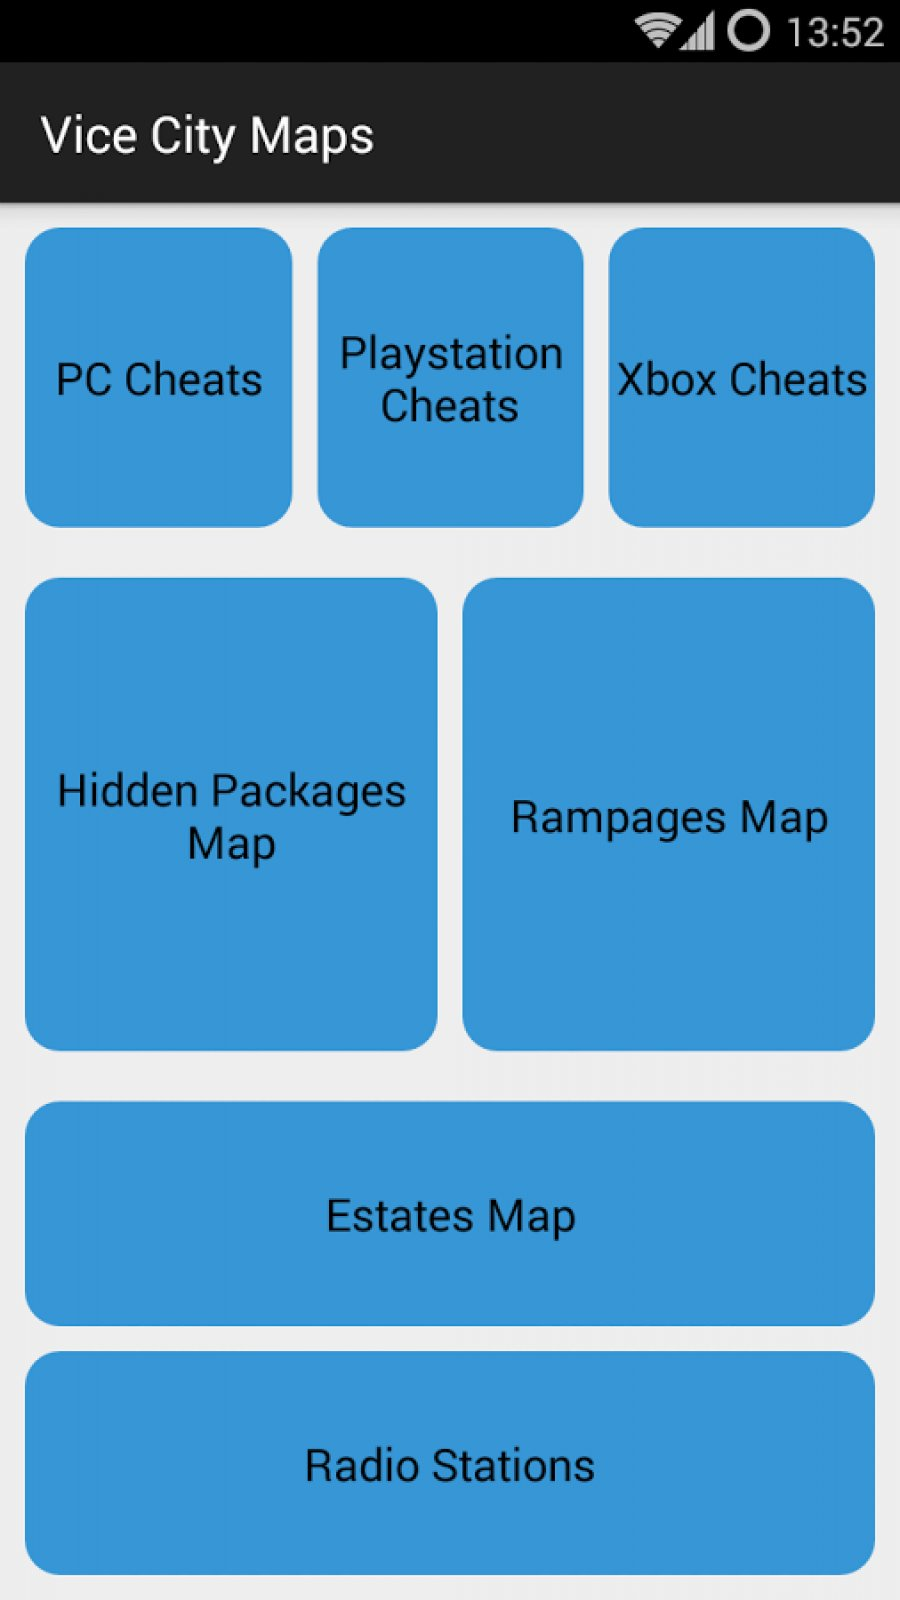 Vice City Maps